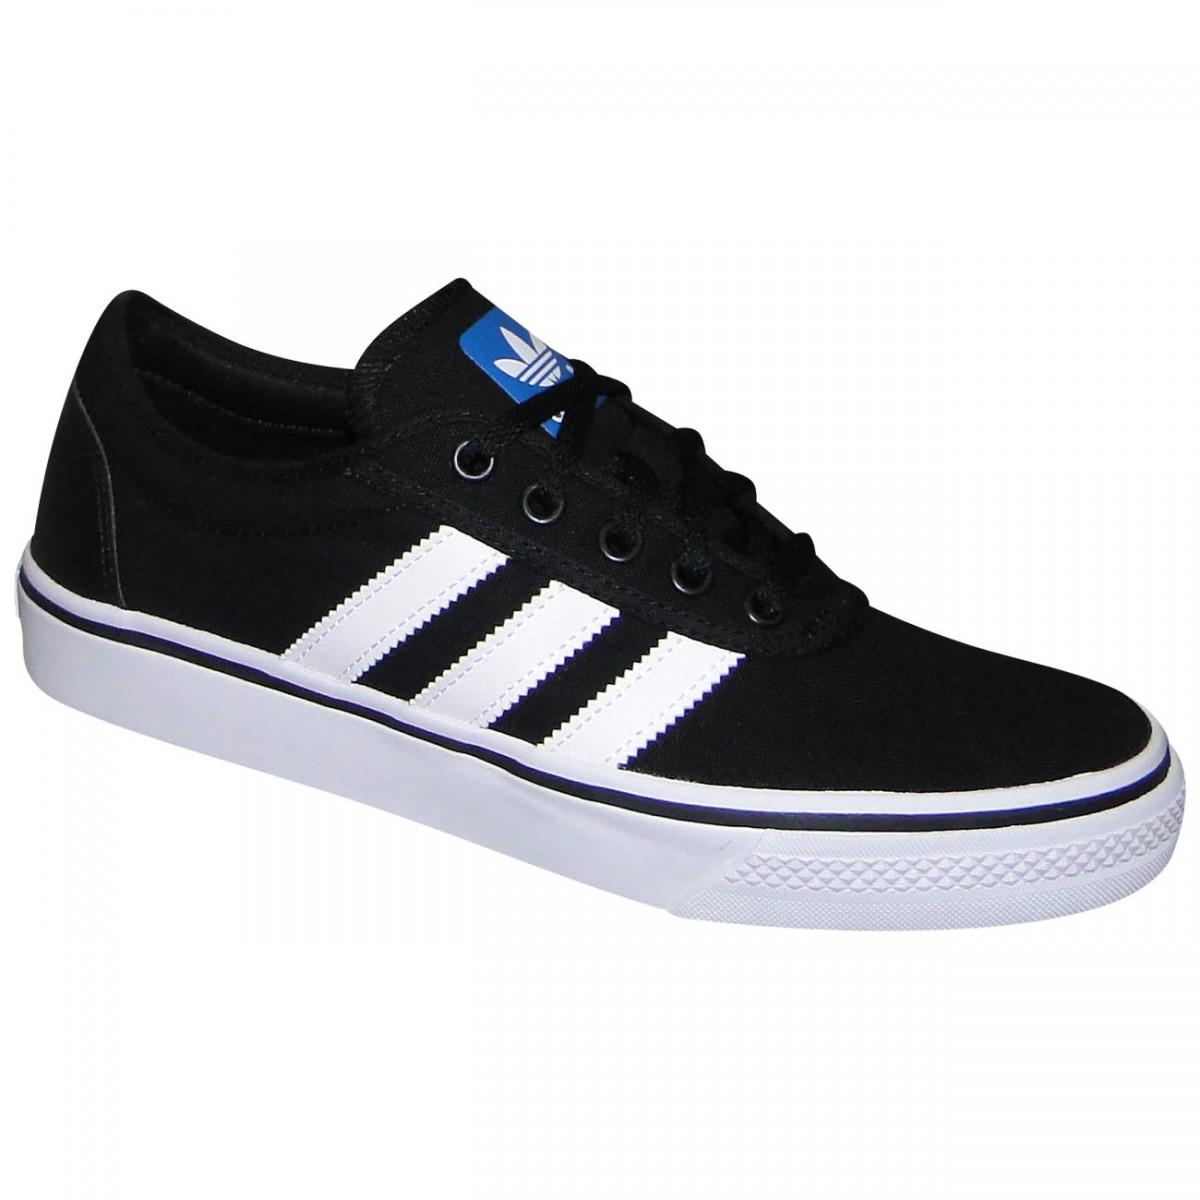 55db338903 Tenis Adidas Adi Ease C75611 - Preto Branco - Chuteira Nike